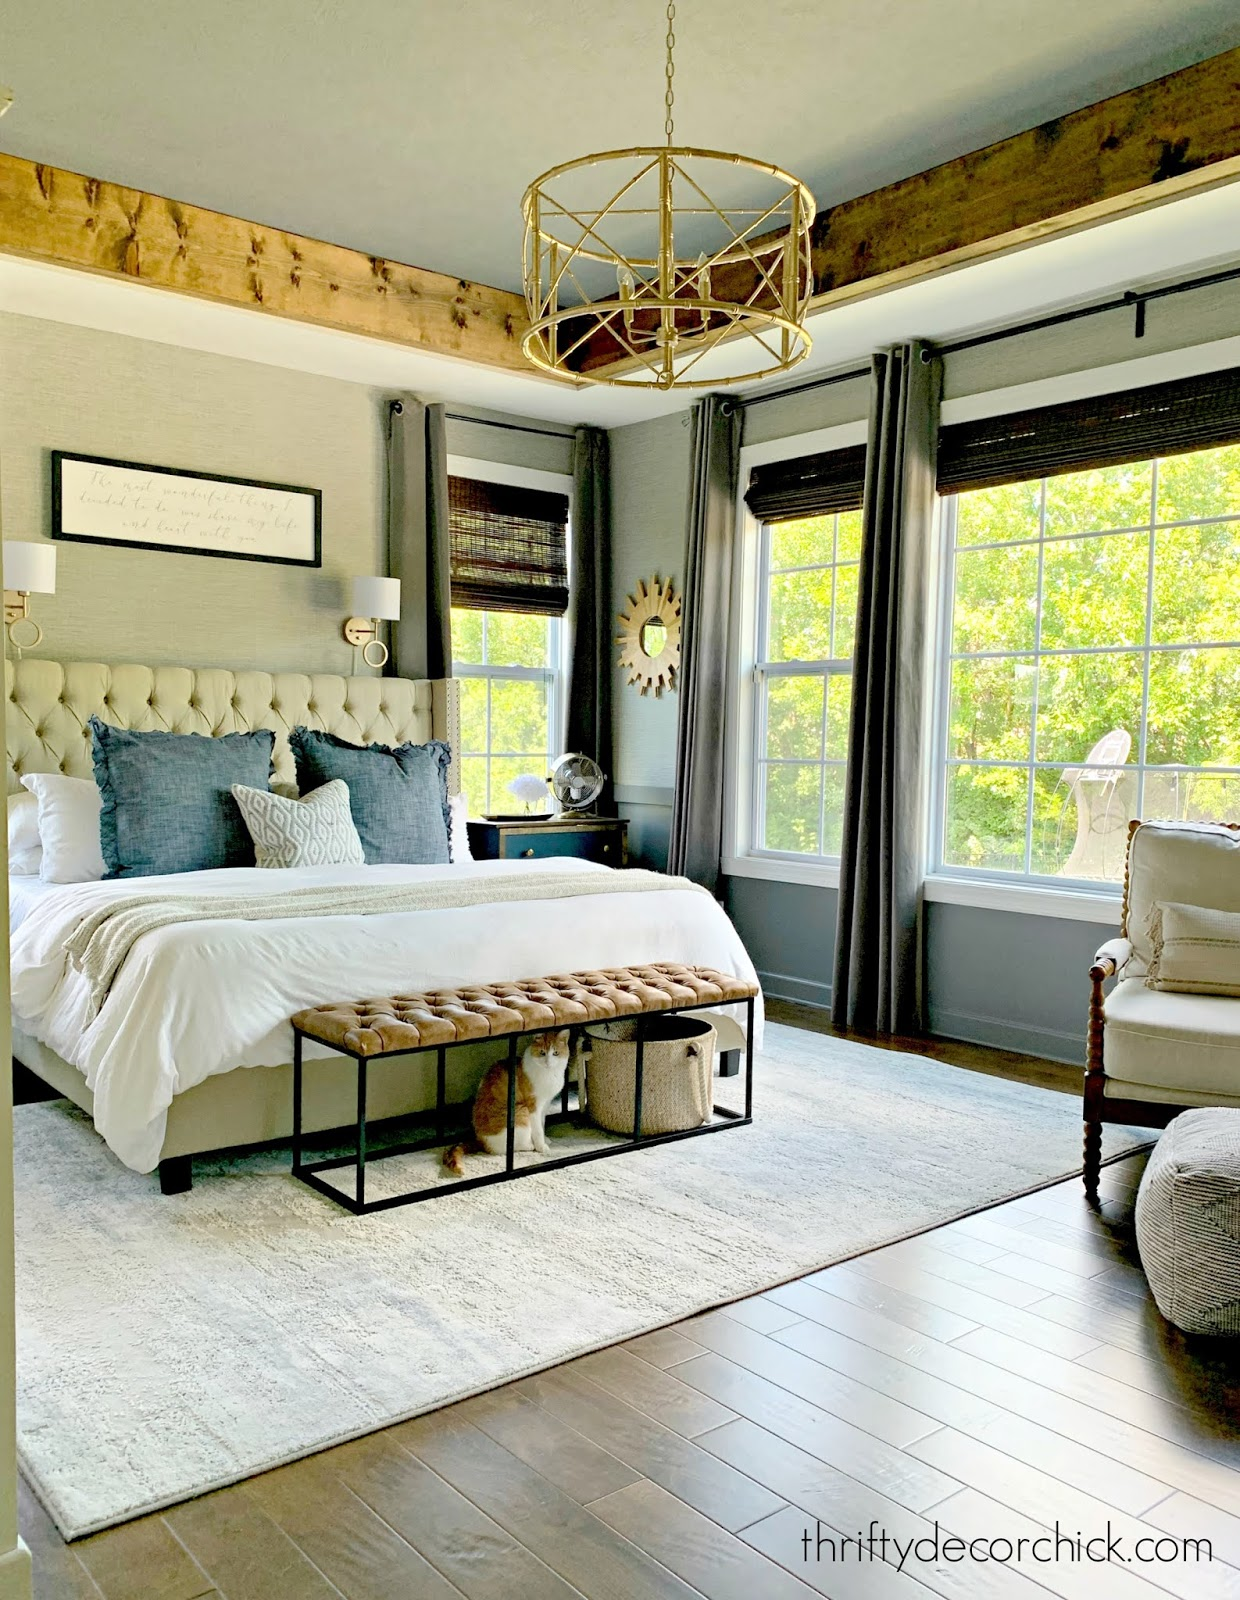 cozy bedroom light accents